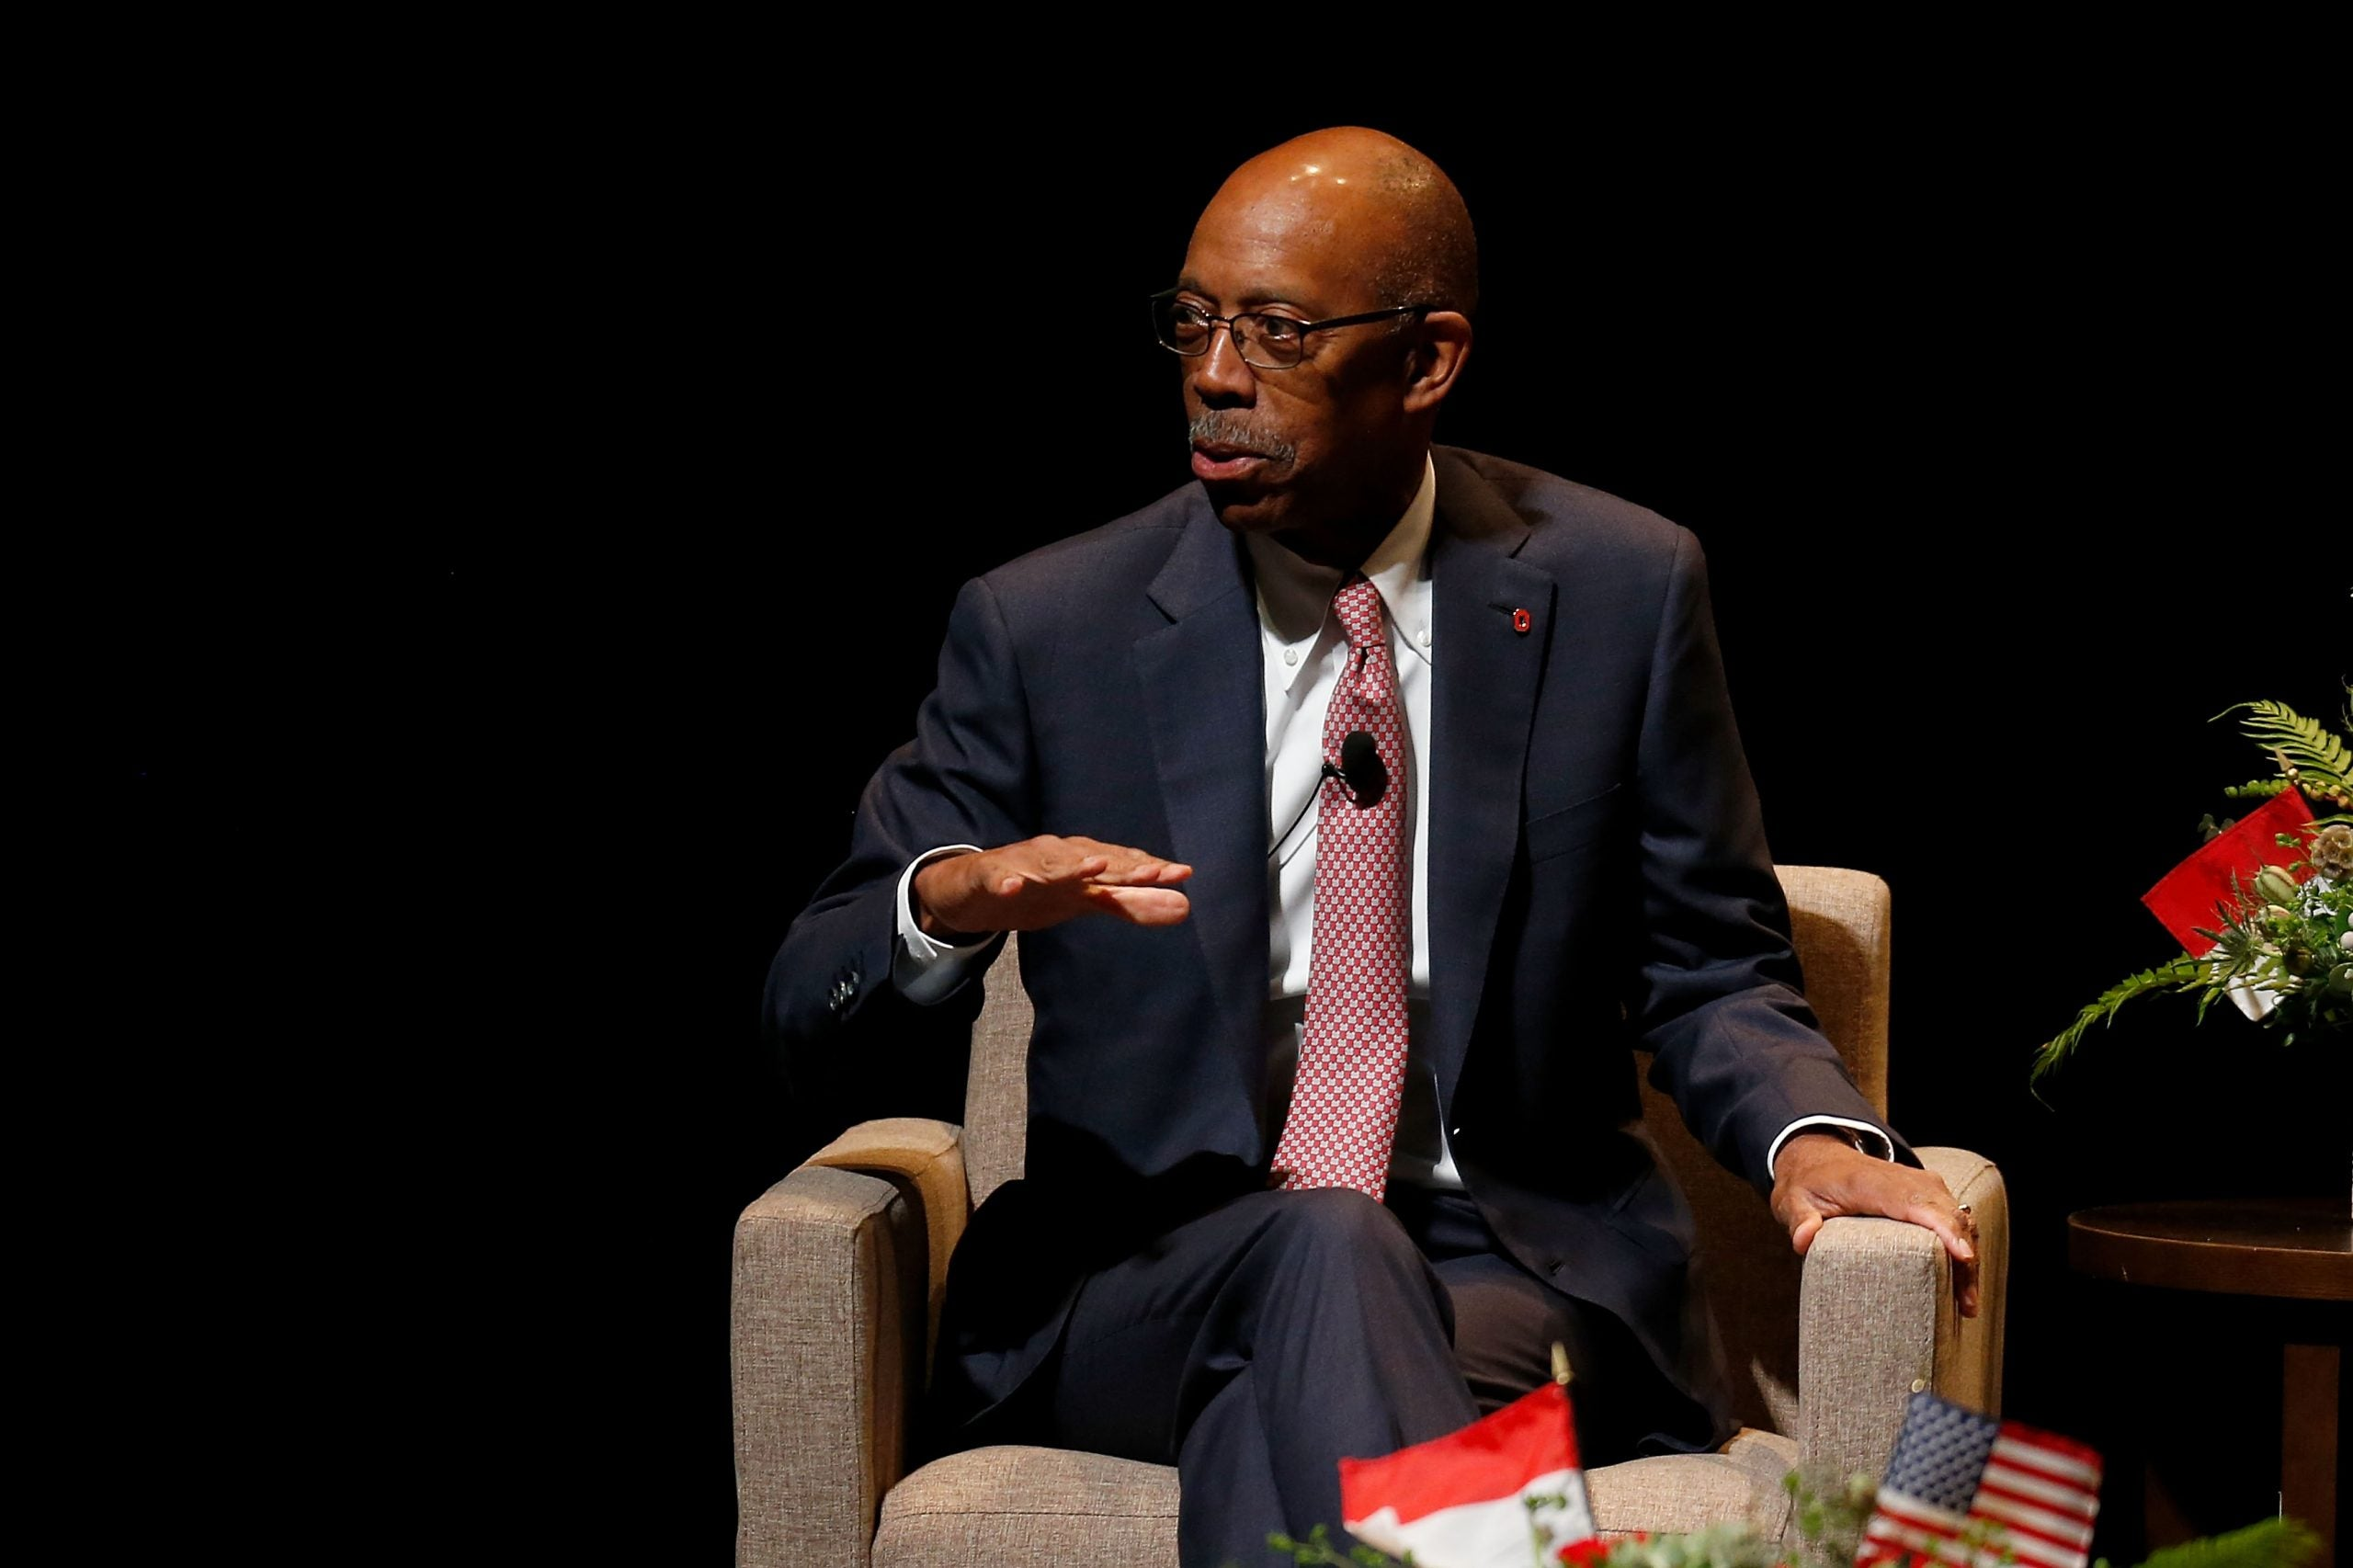 Michael V. Drake Becomes First Black President Of University Of California